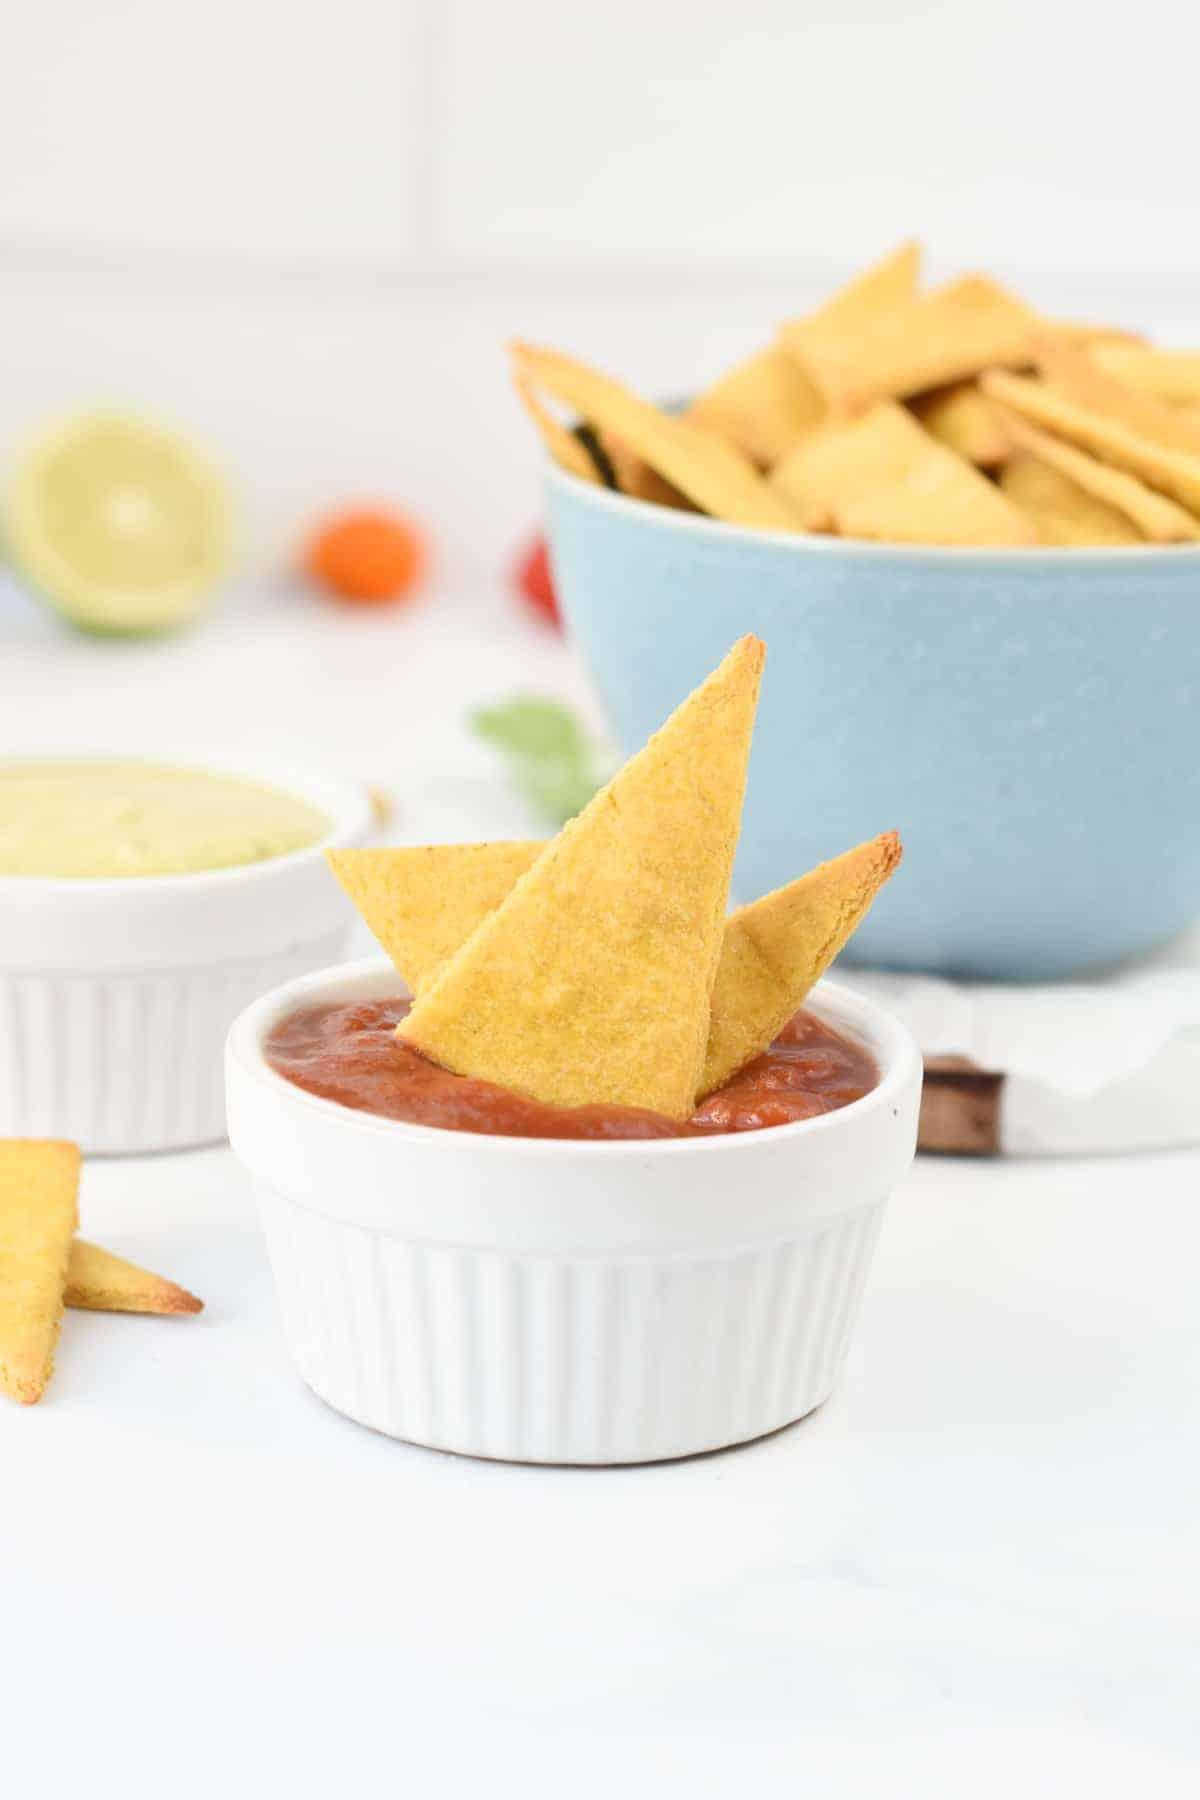 Chickpea tortilla chips